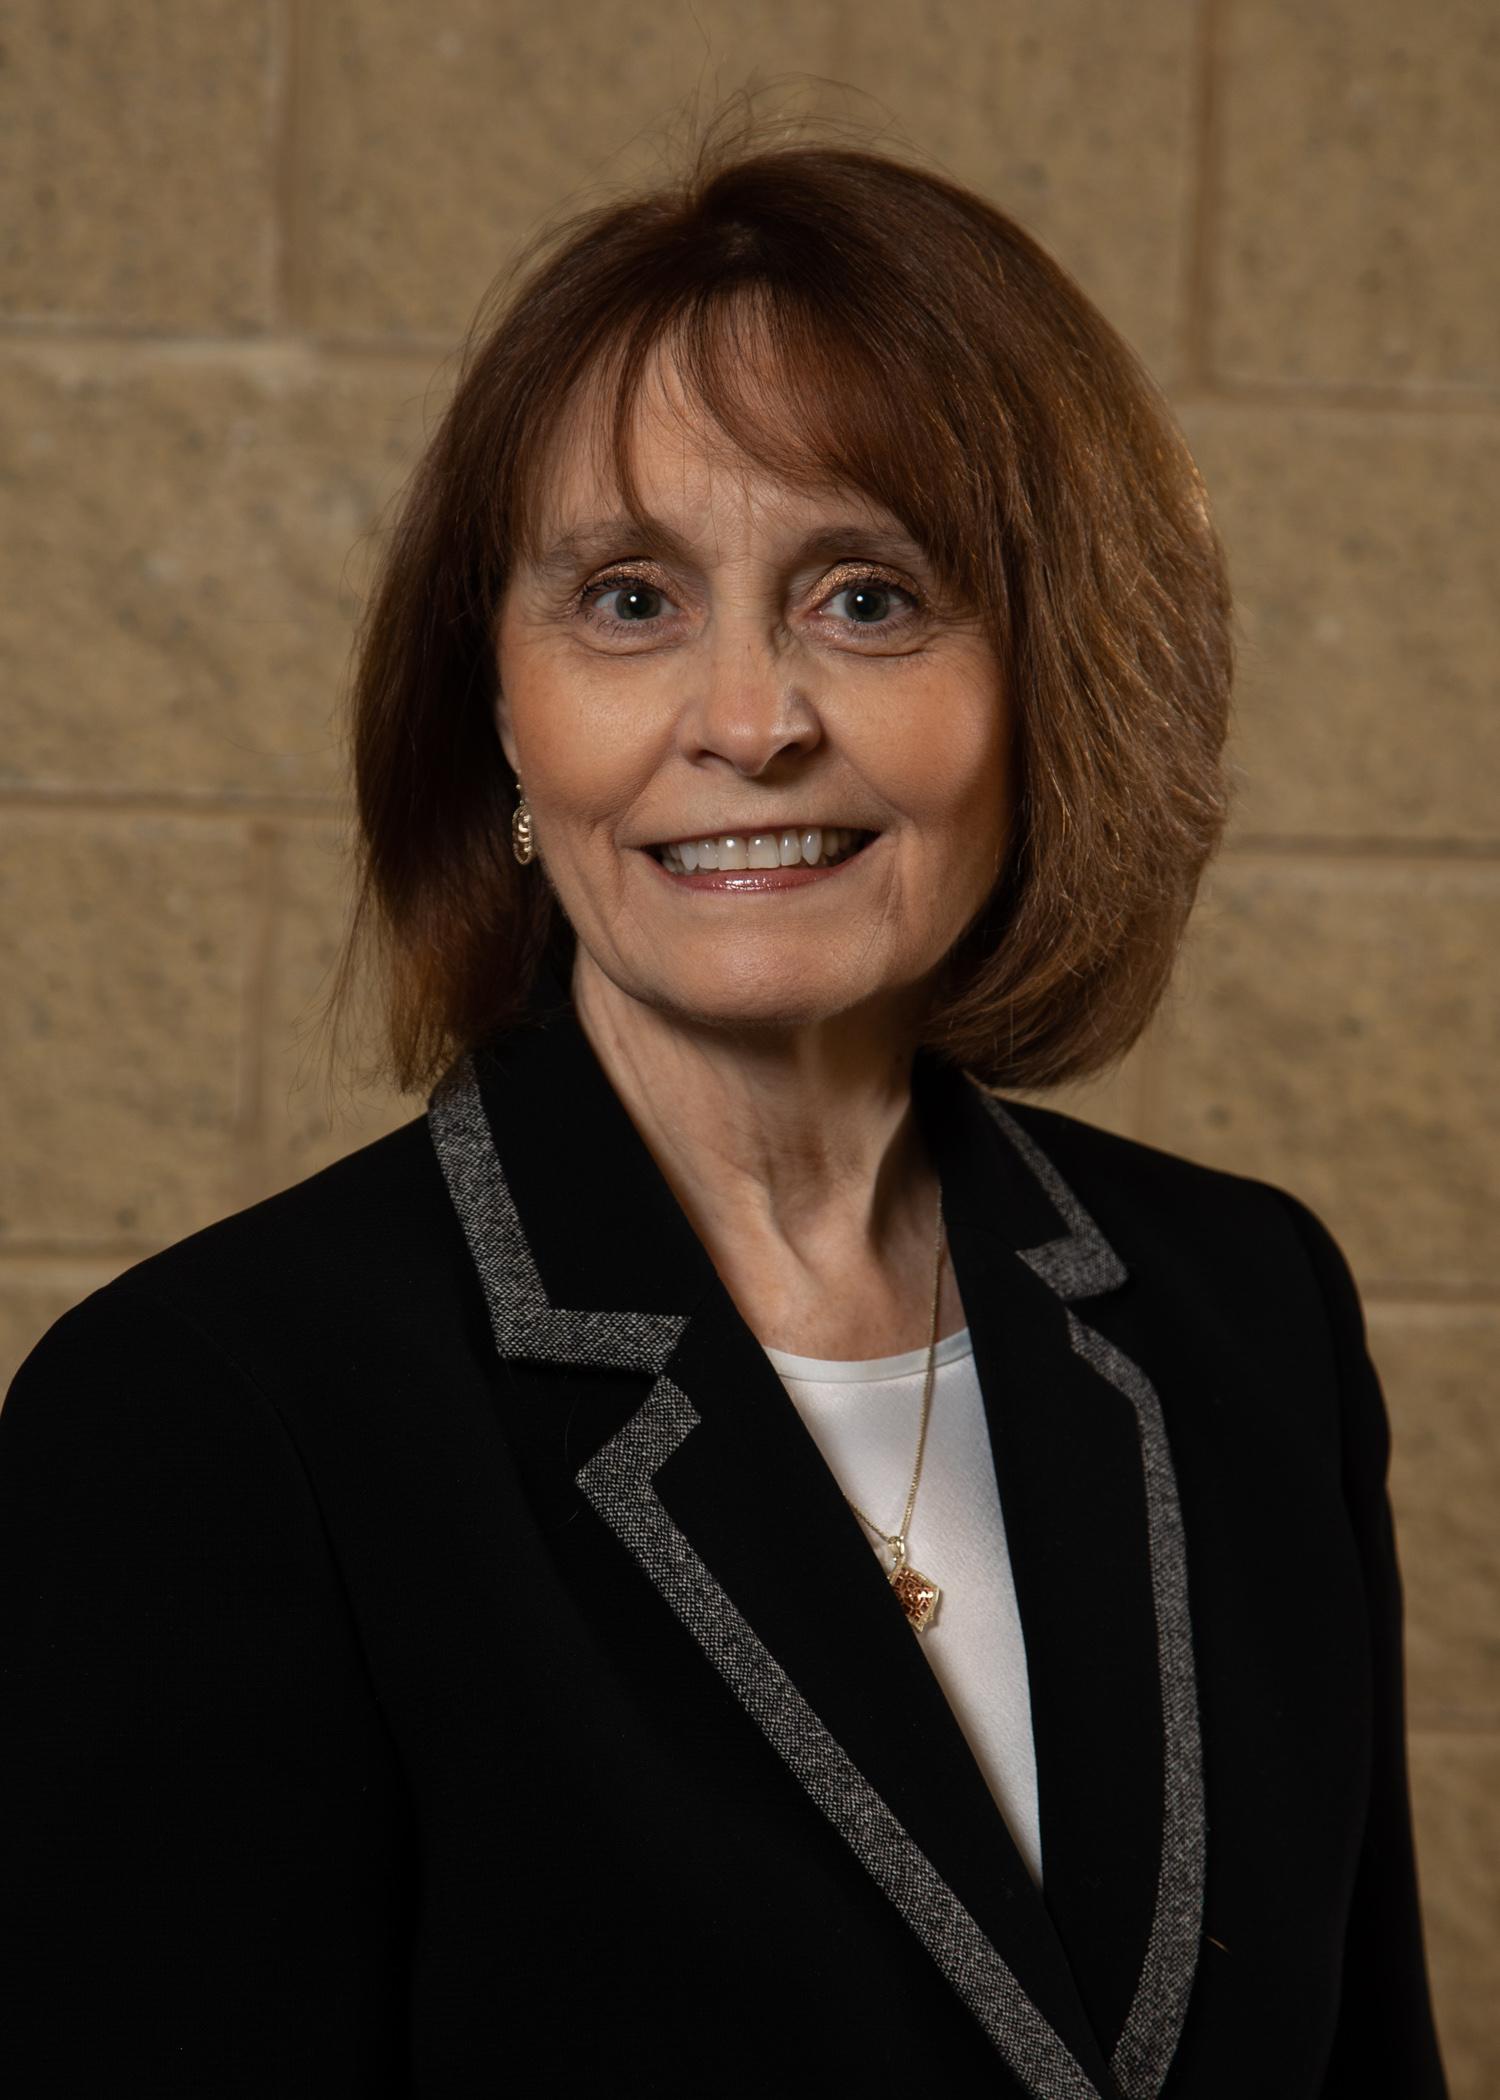 JACKIE WAGNON PRESIDENT